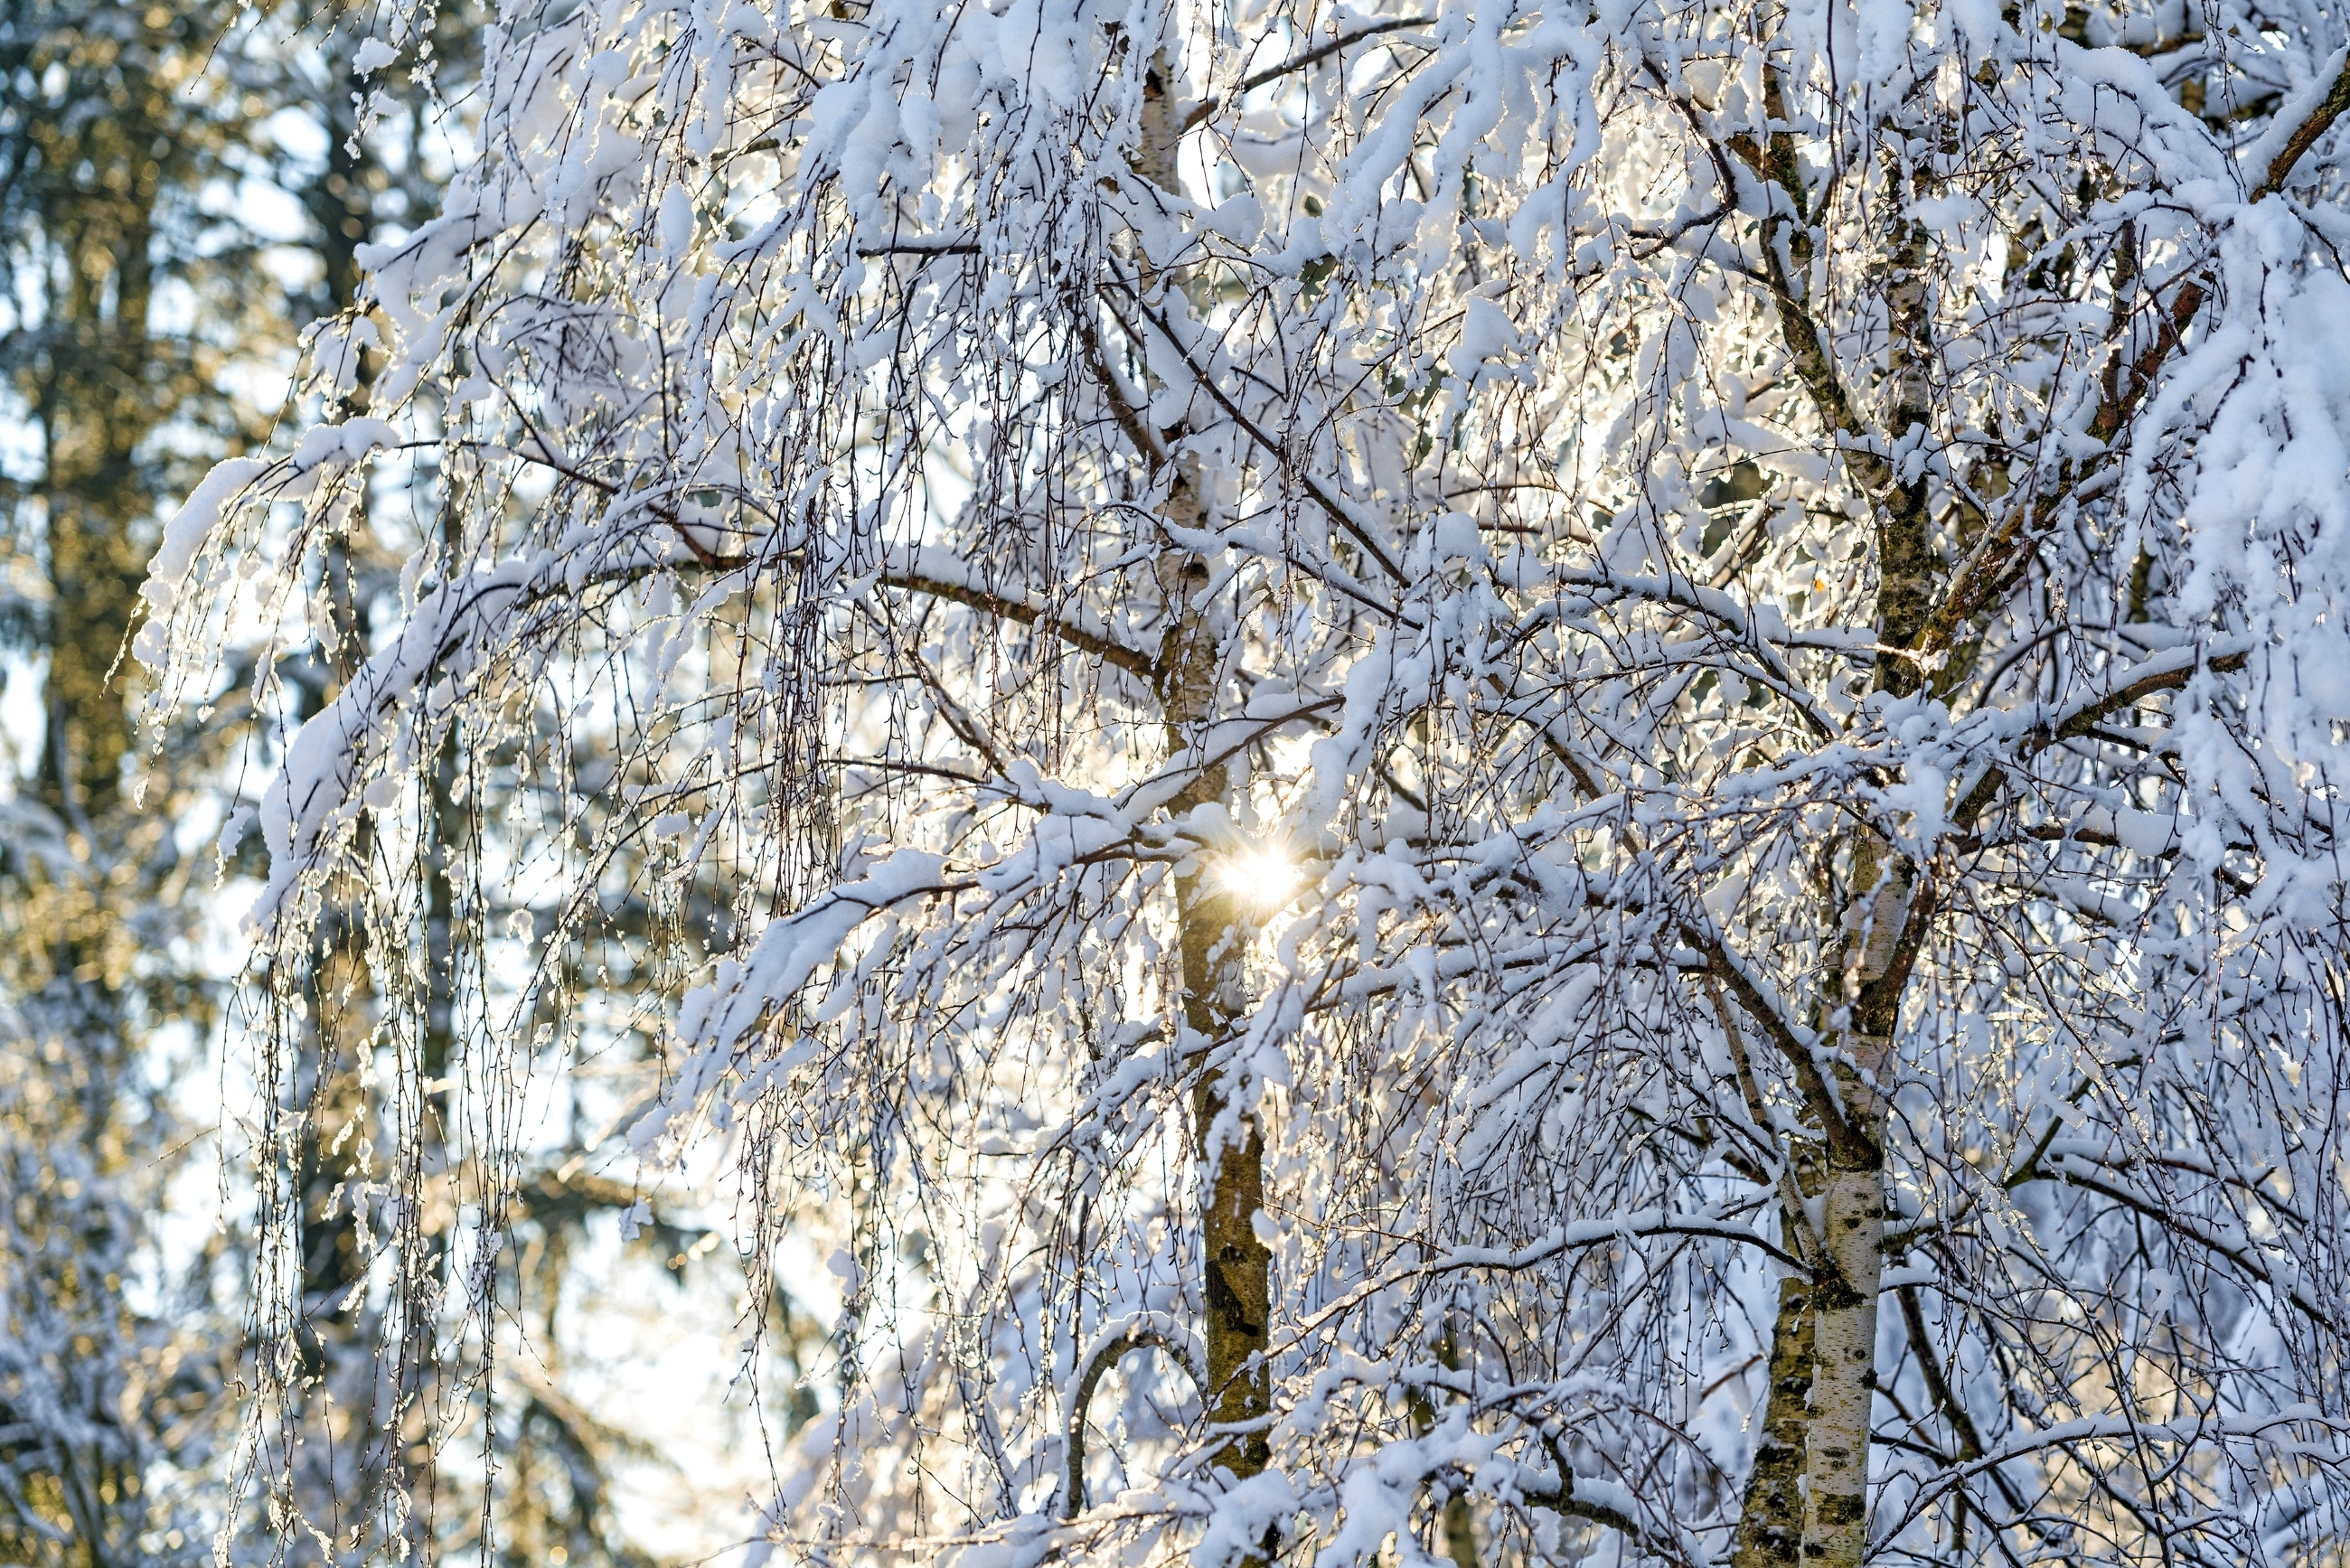 снег ветви лес snow branches forest  № 442845 бесплатно